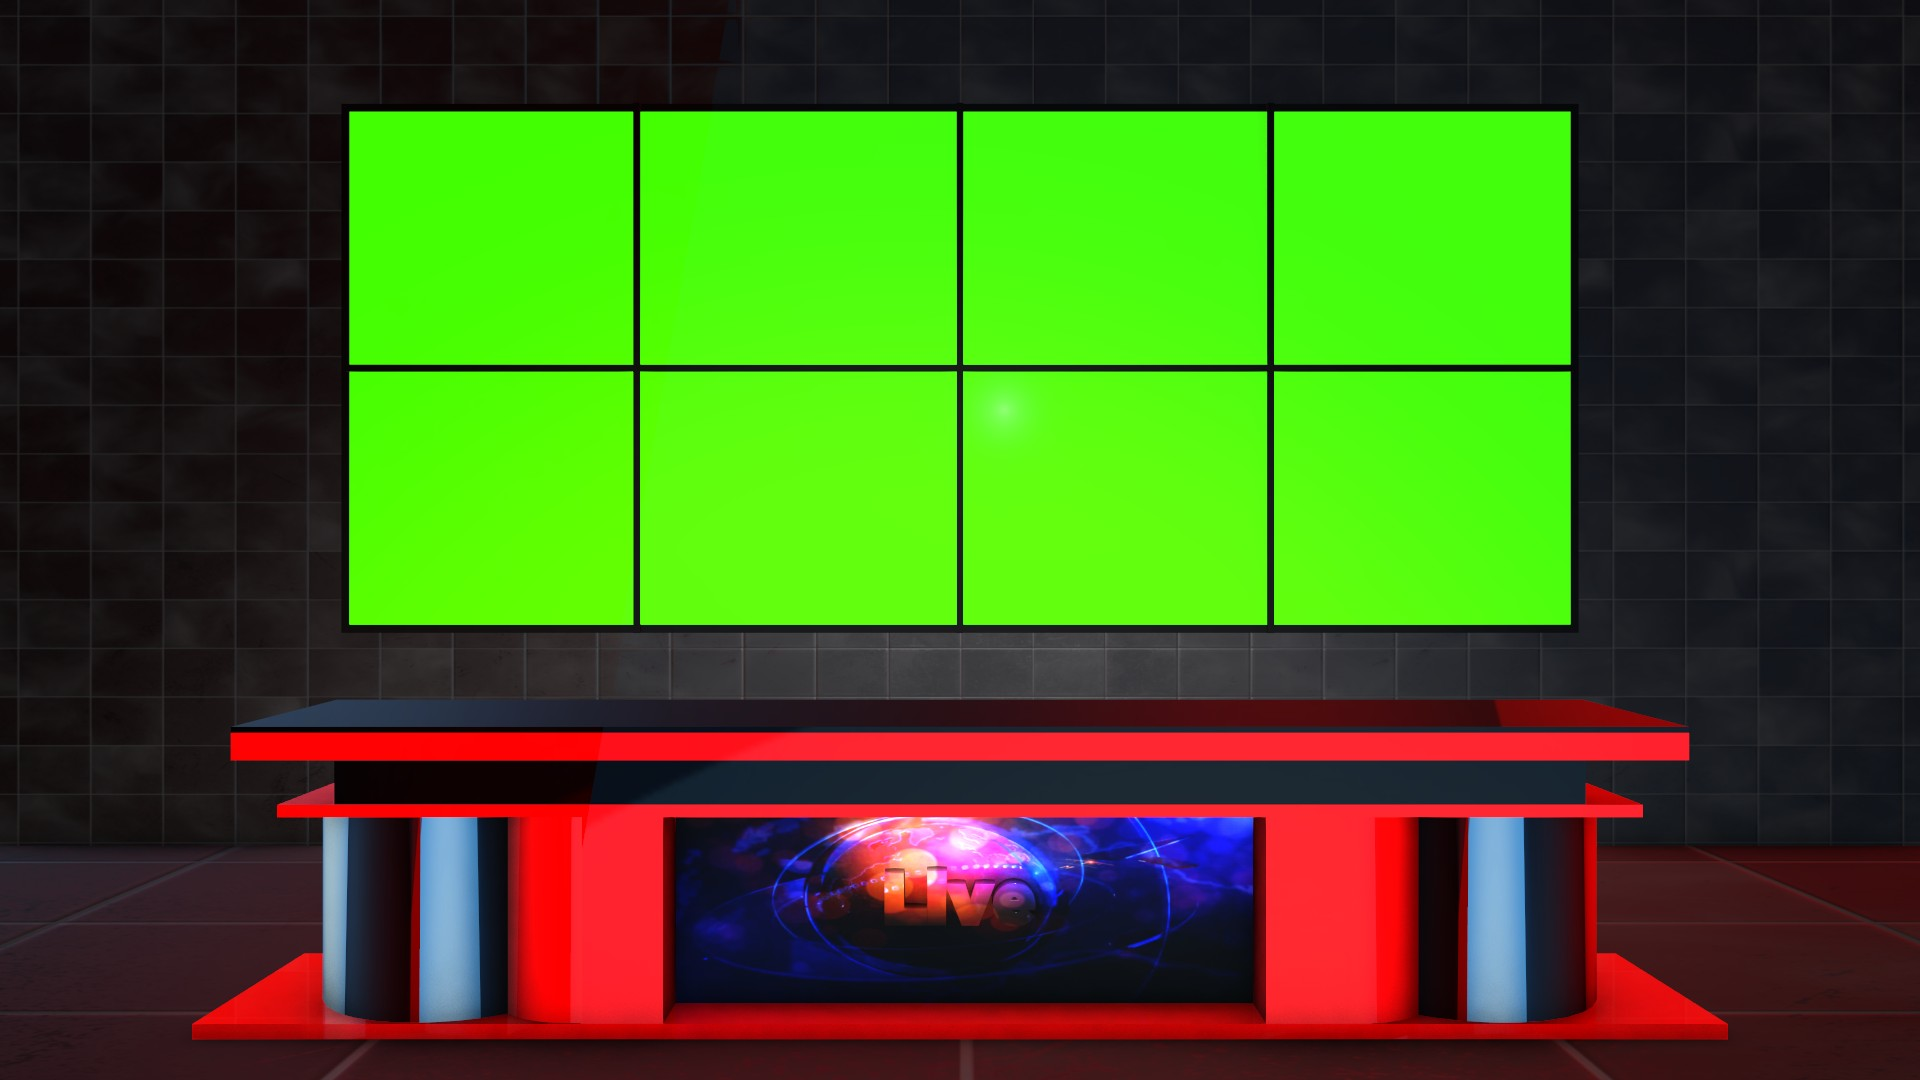 Free Green Screen Studio Backgrounds